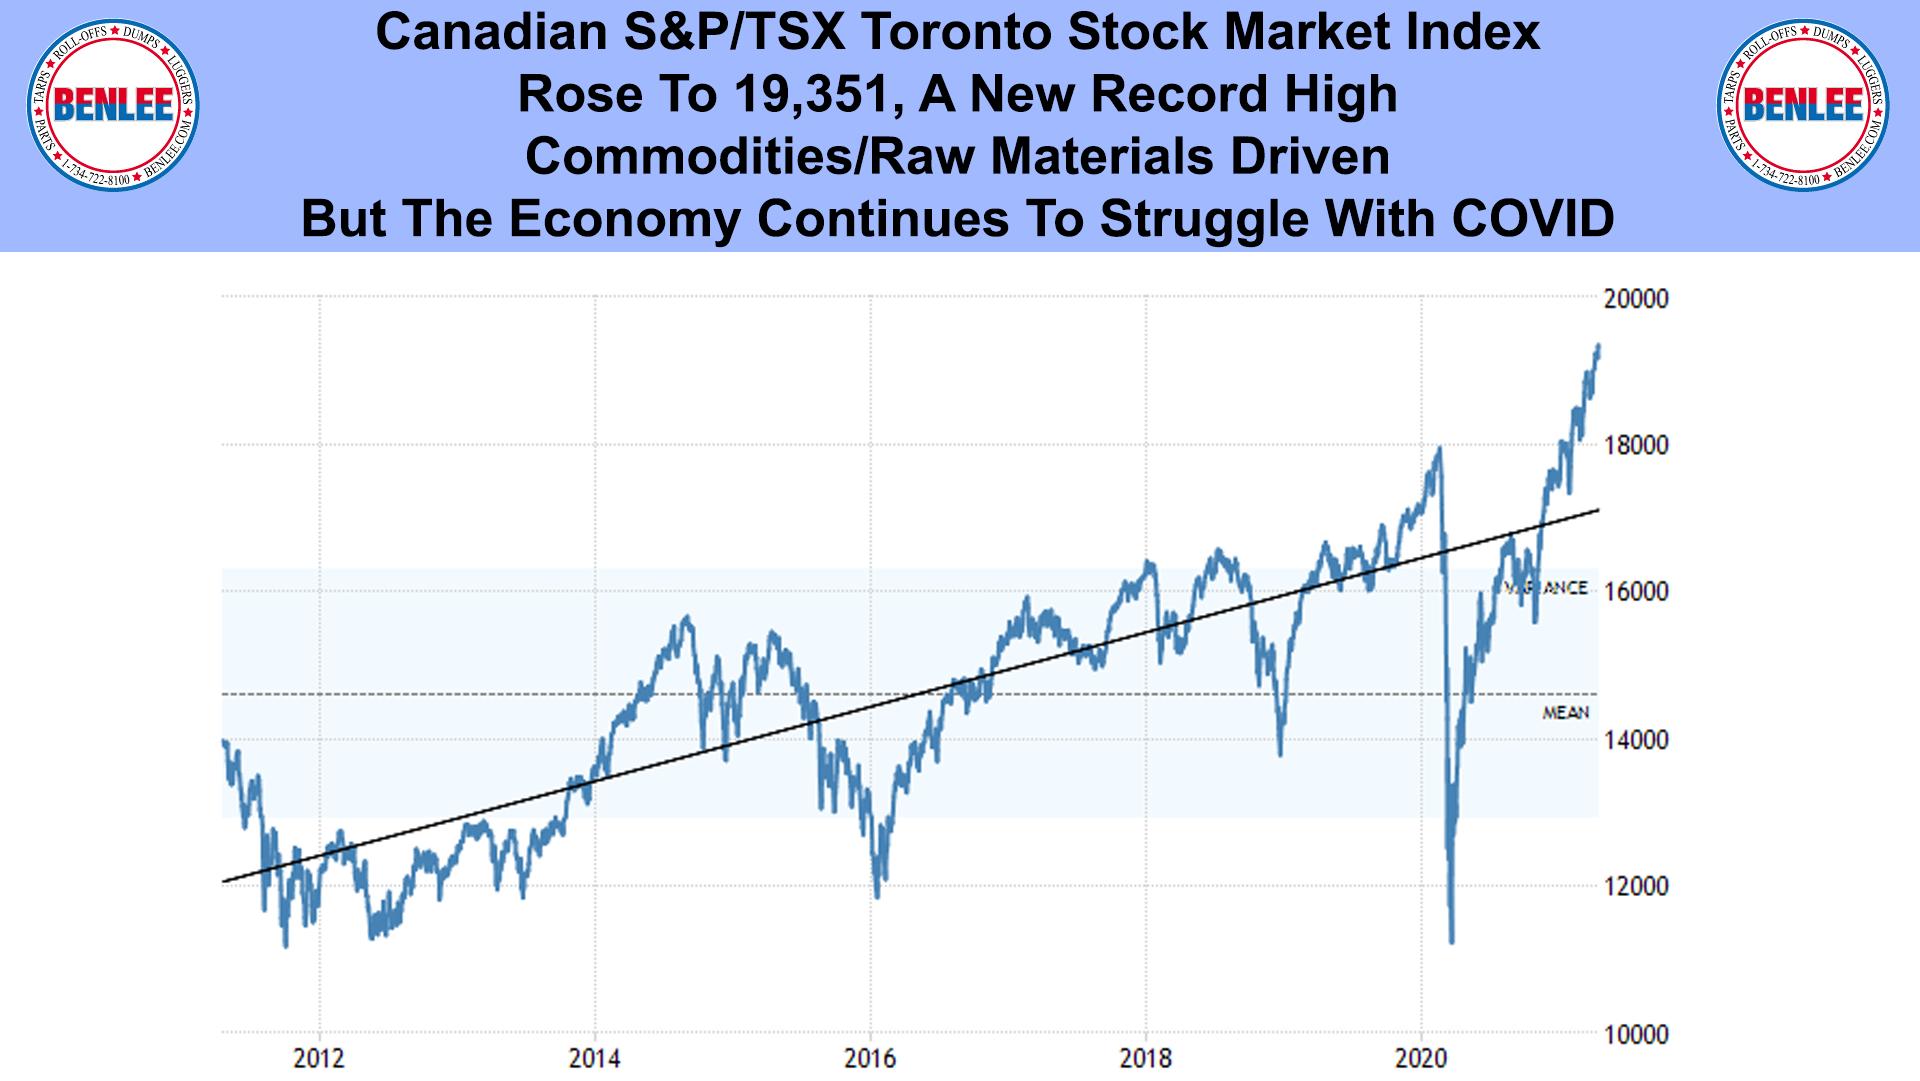 Canadian S&P TSX Toronto Stock Market Index